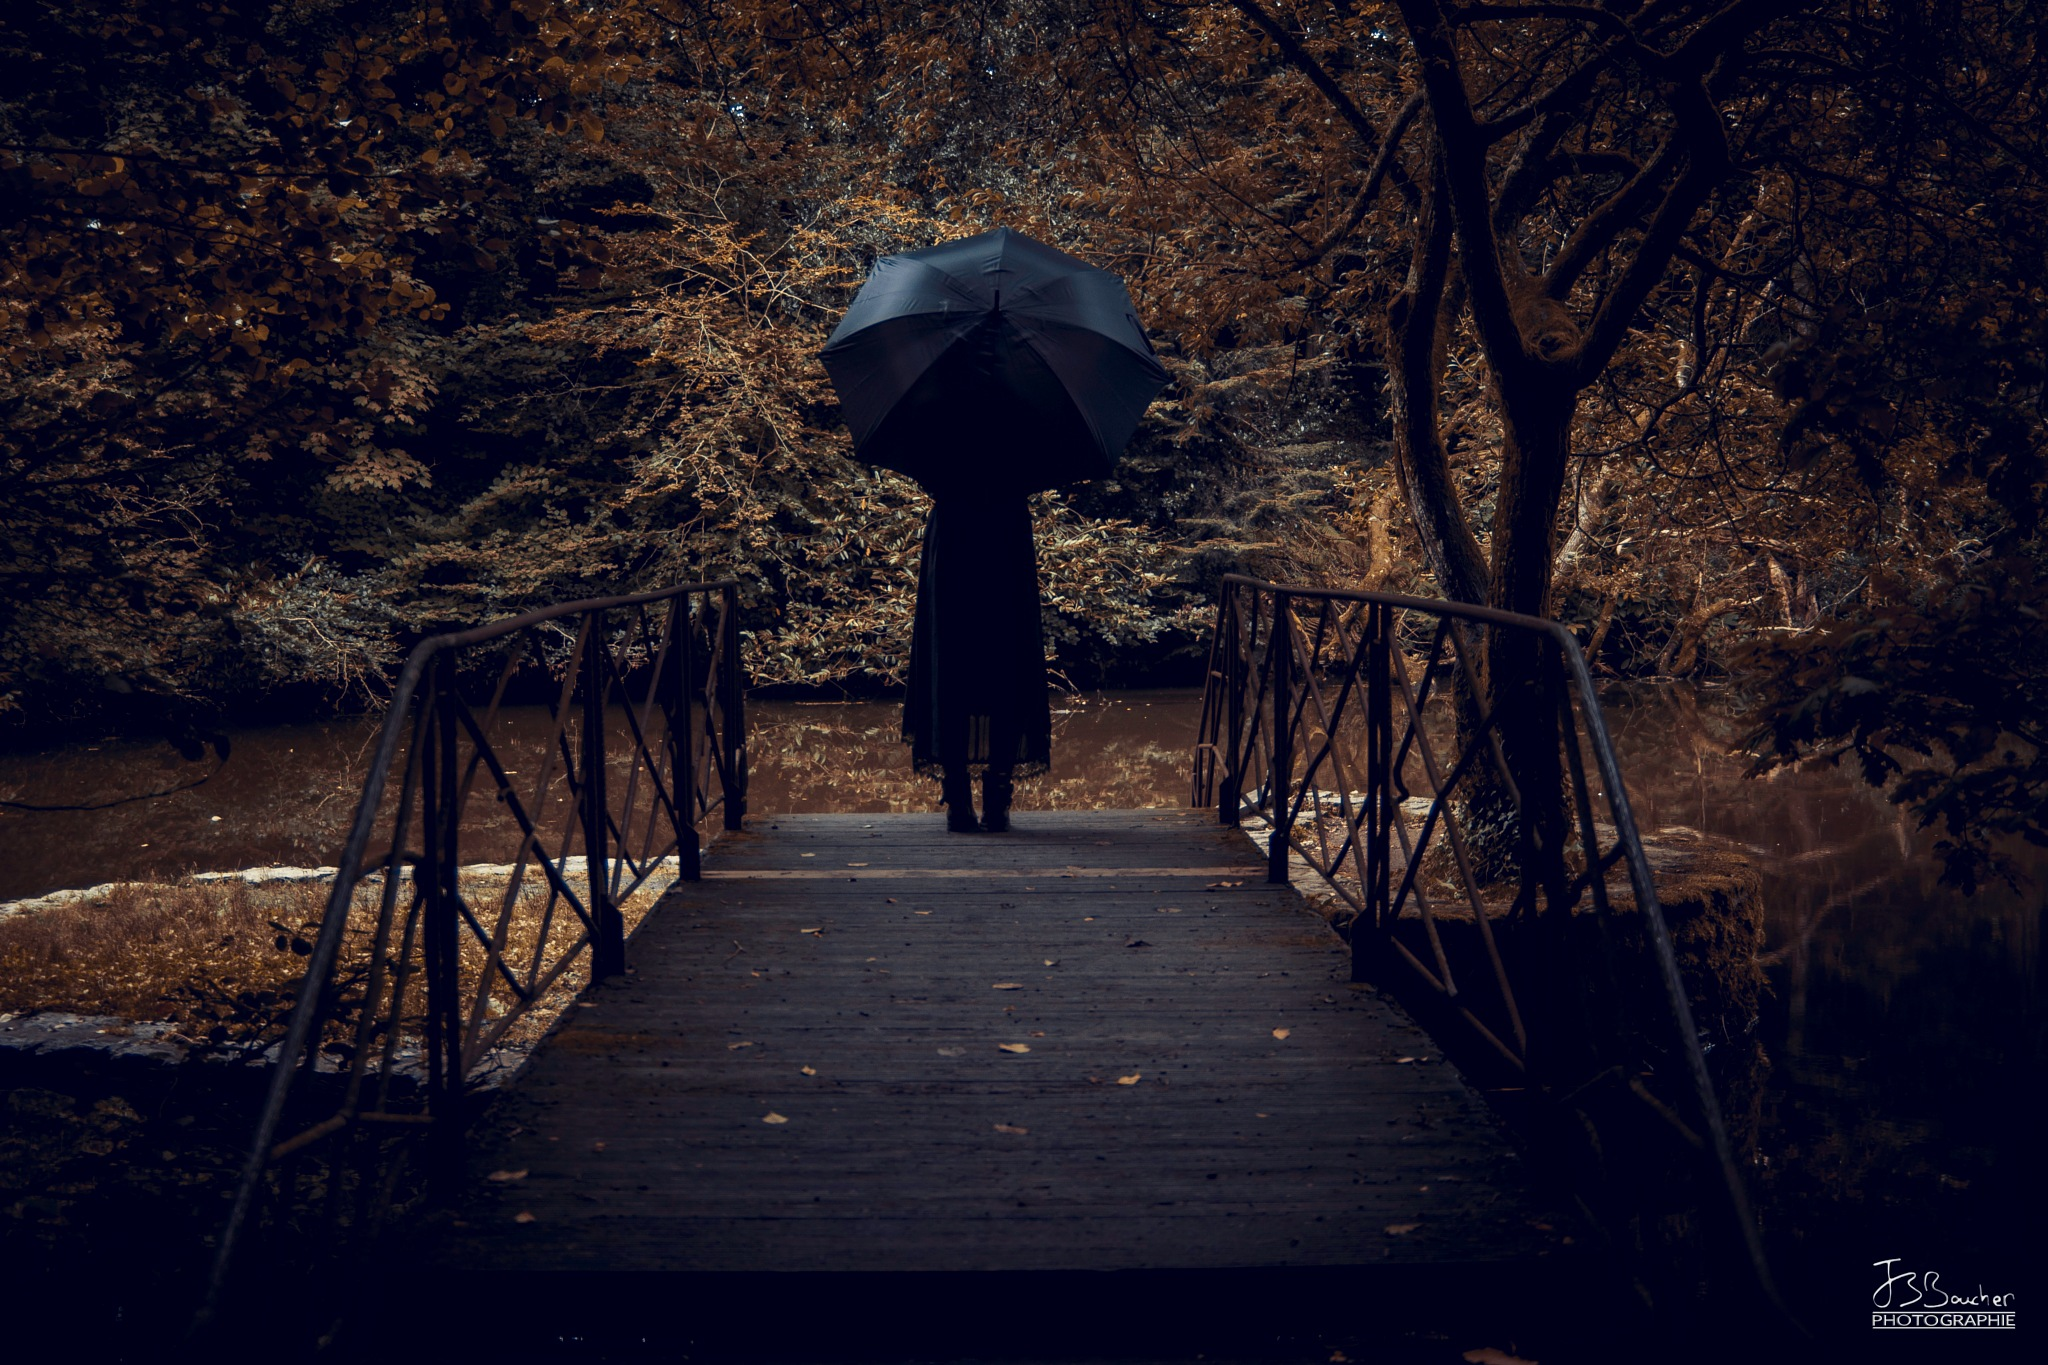 Alone by JB Boucher